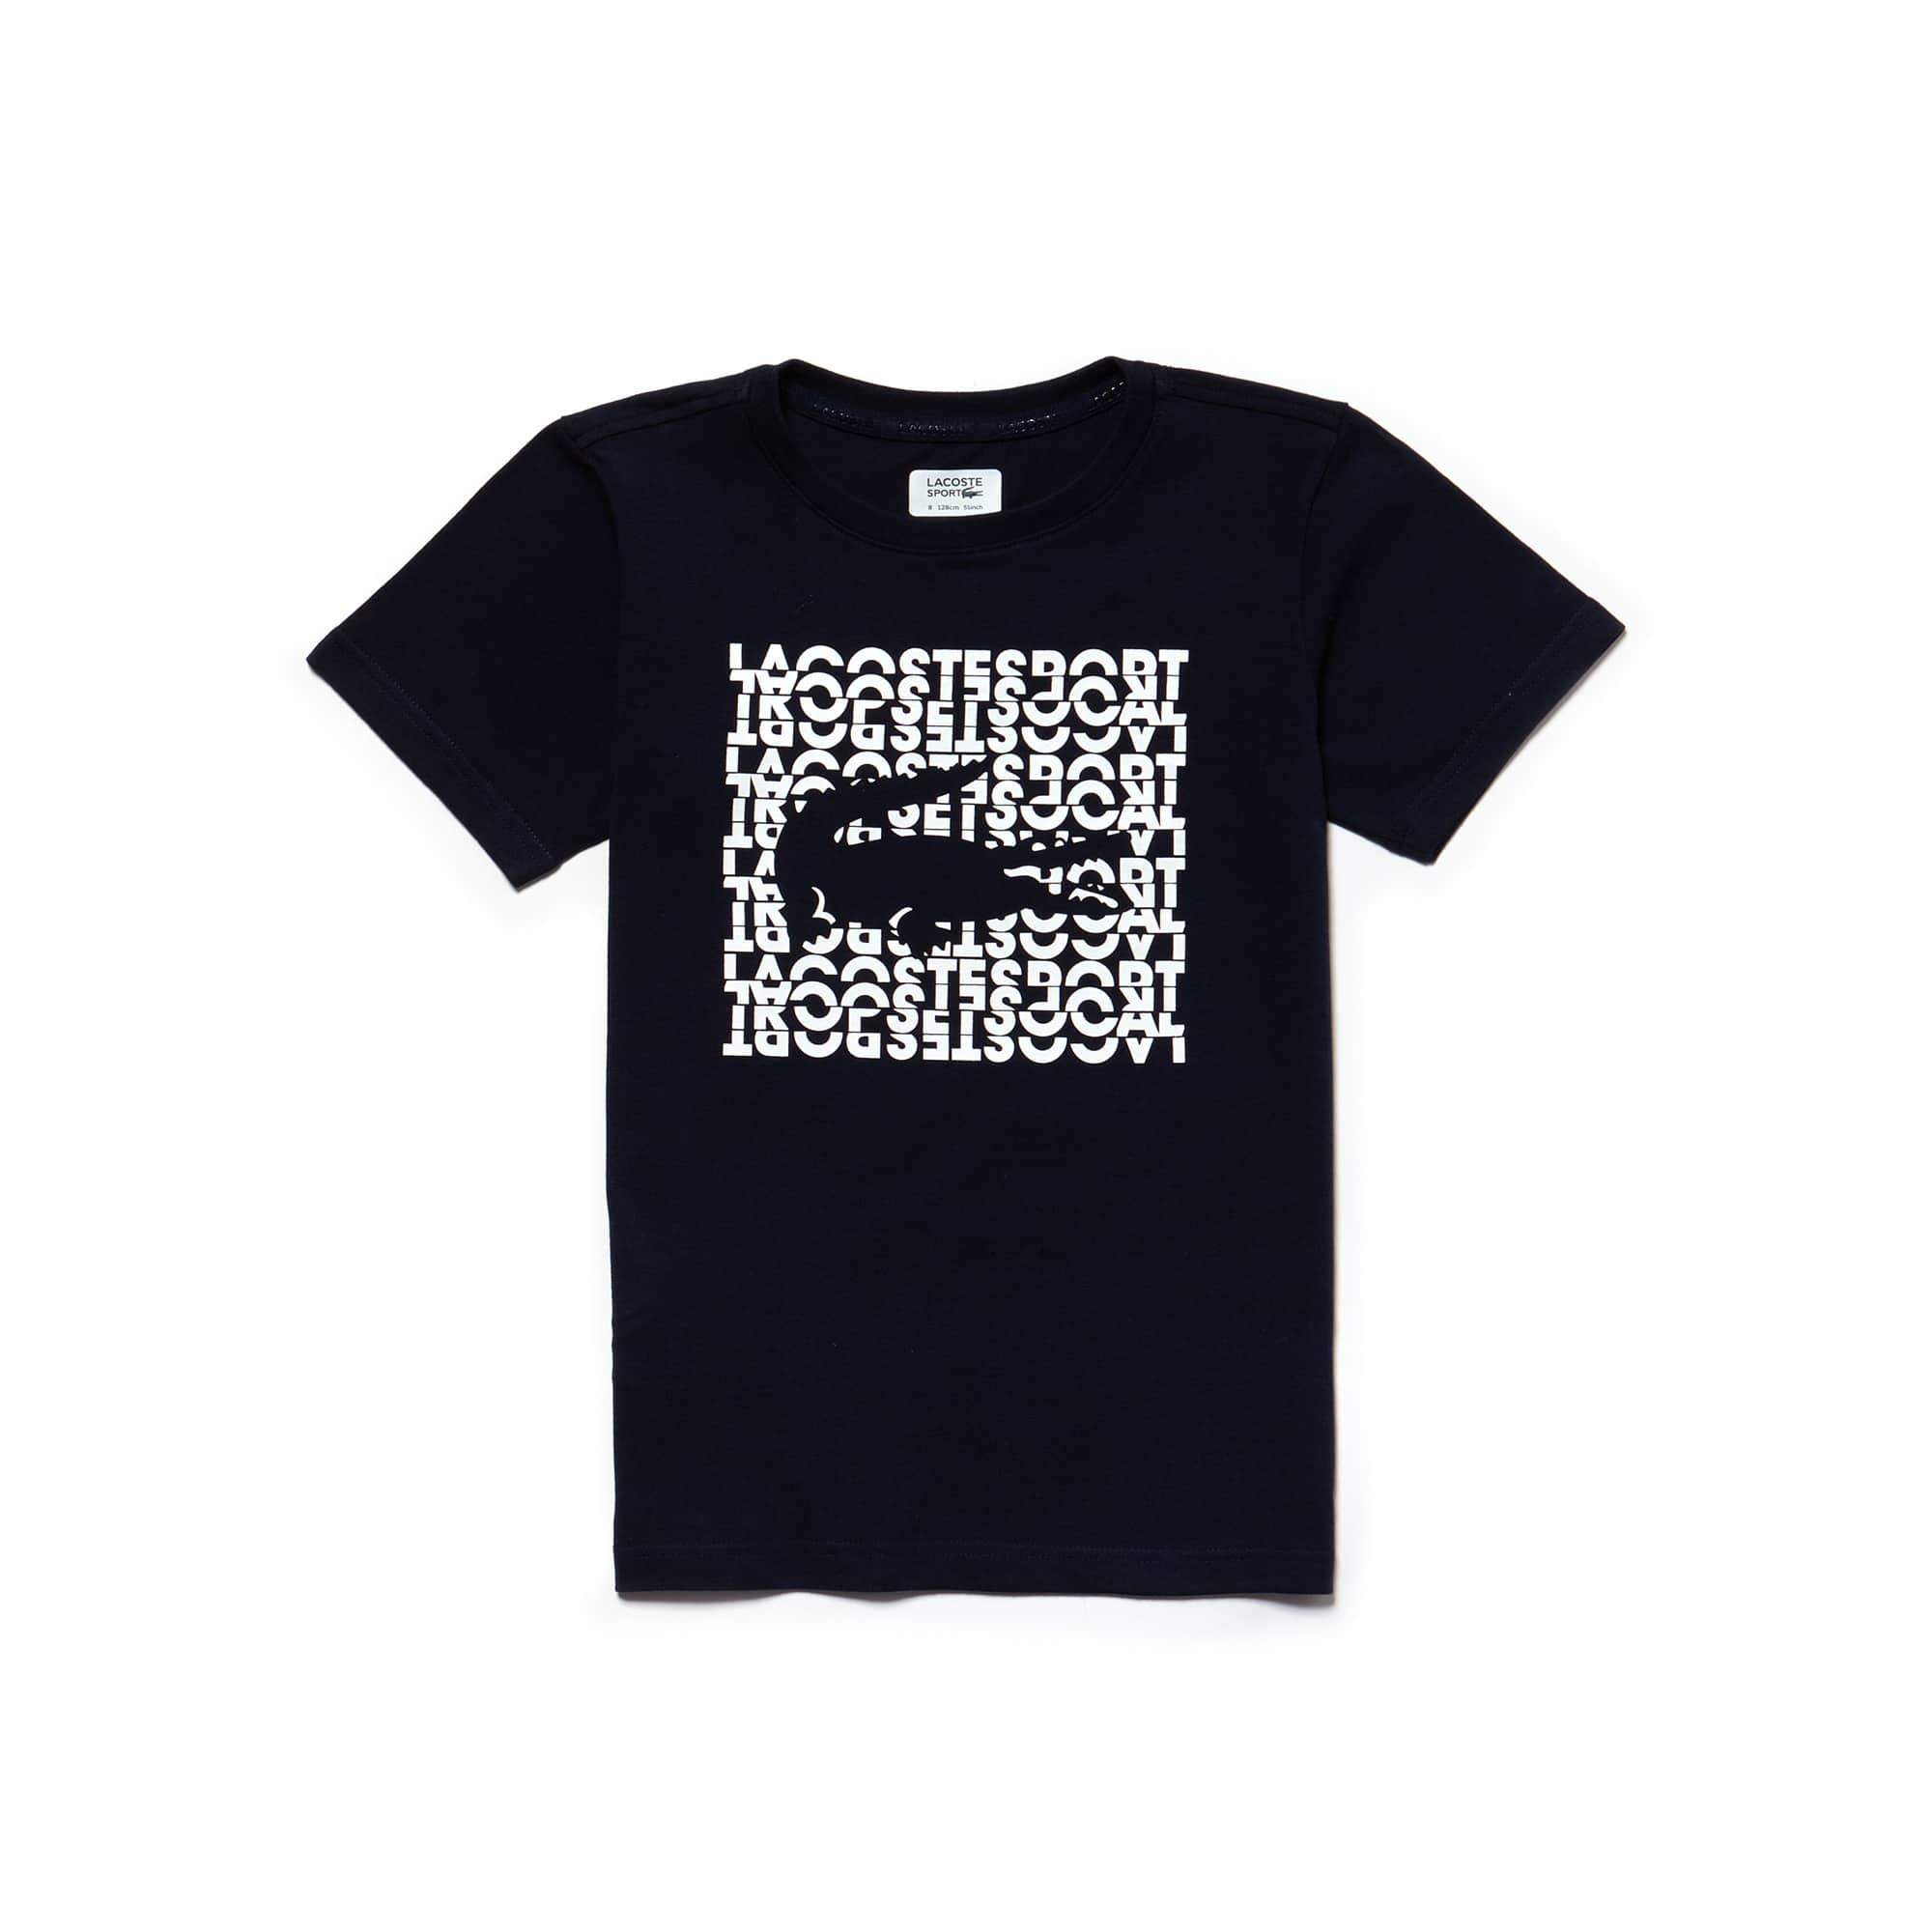 Boys' Lacoste SPORT Lettering Technical Jersey Tennis T-shirt